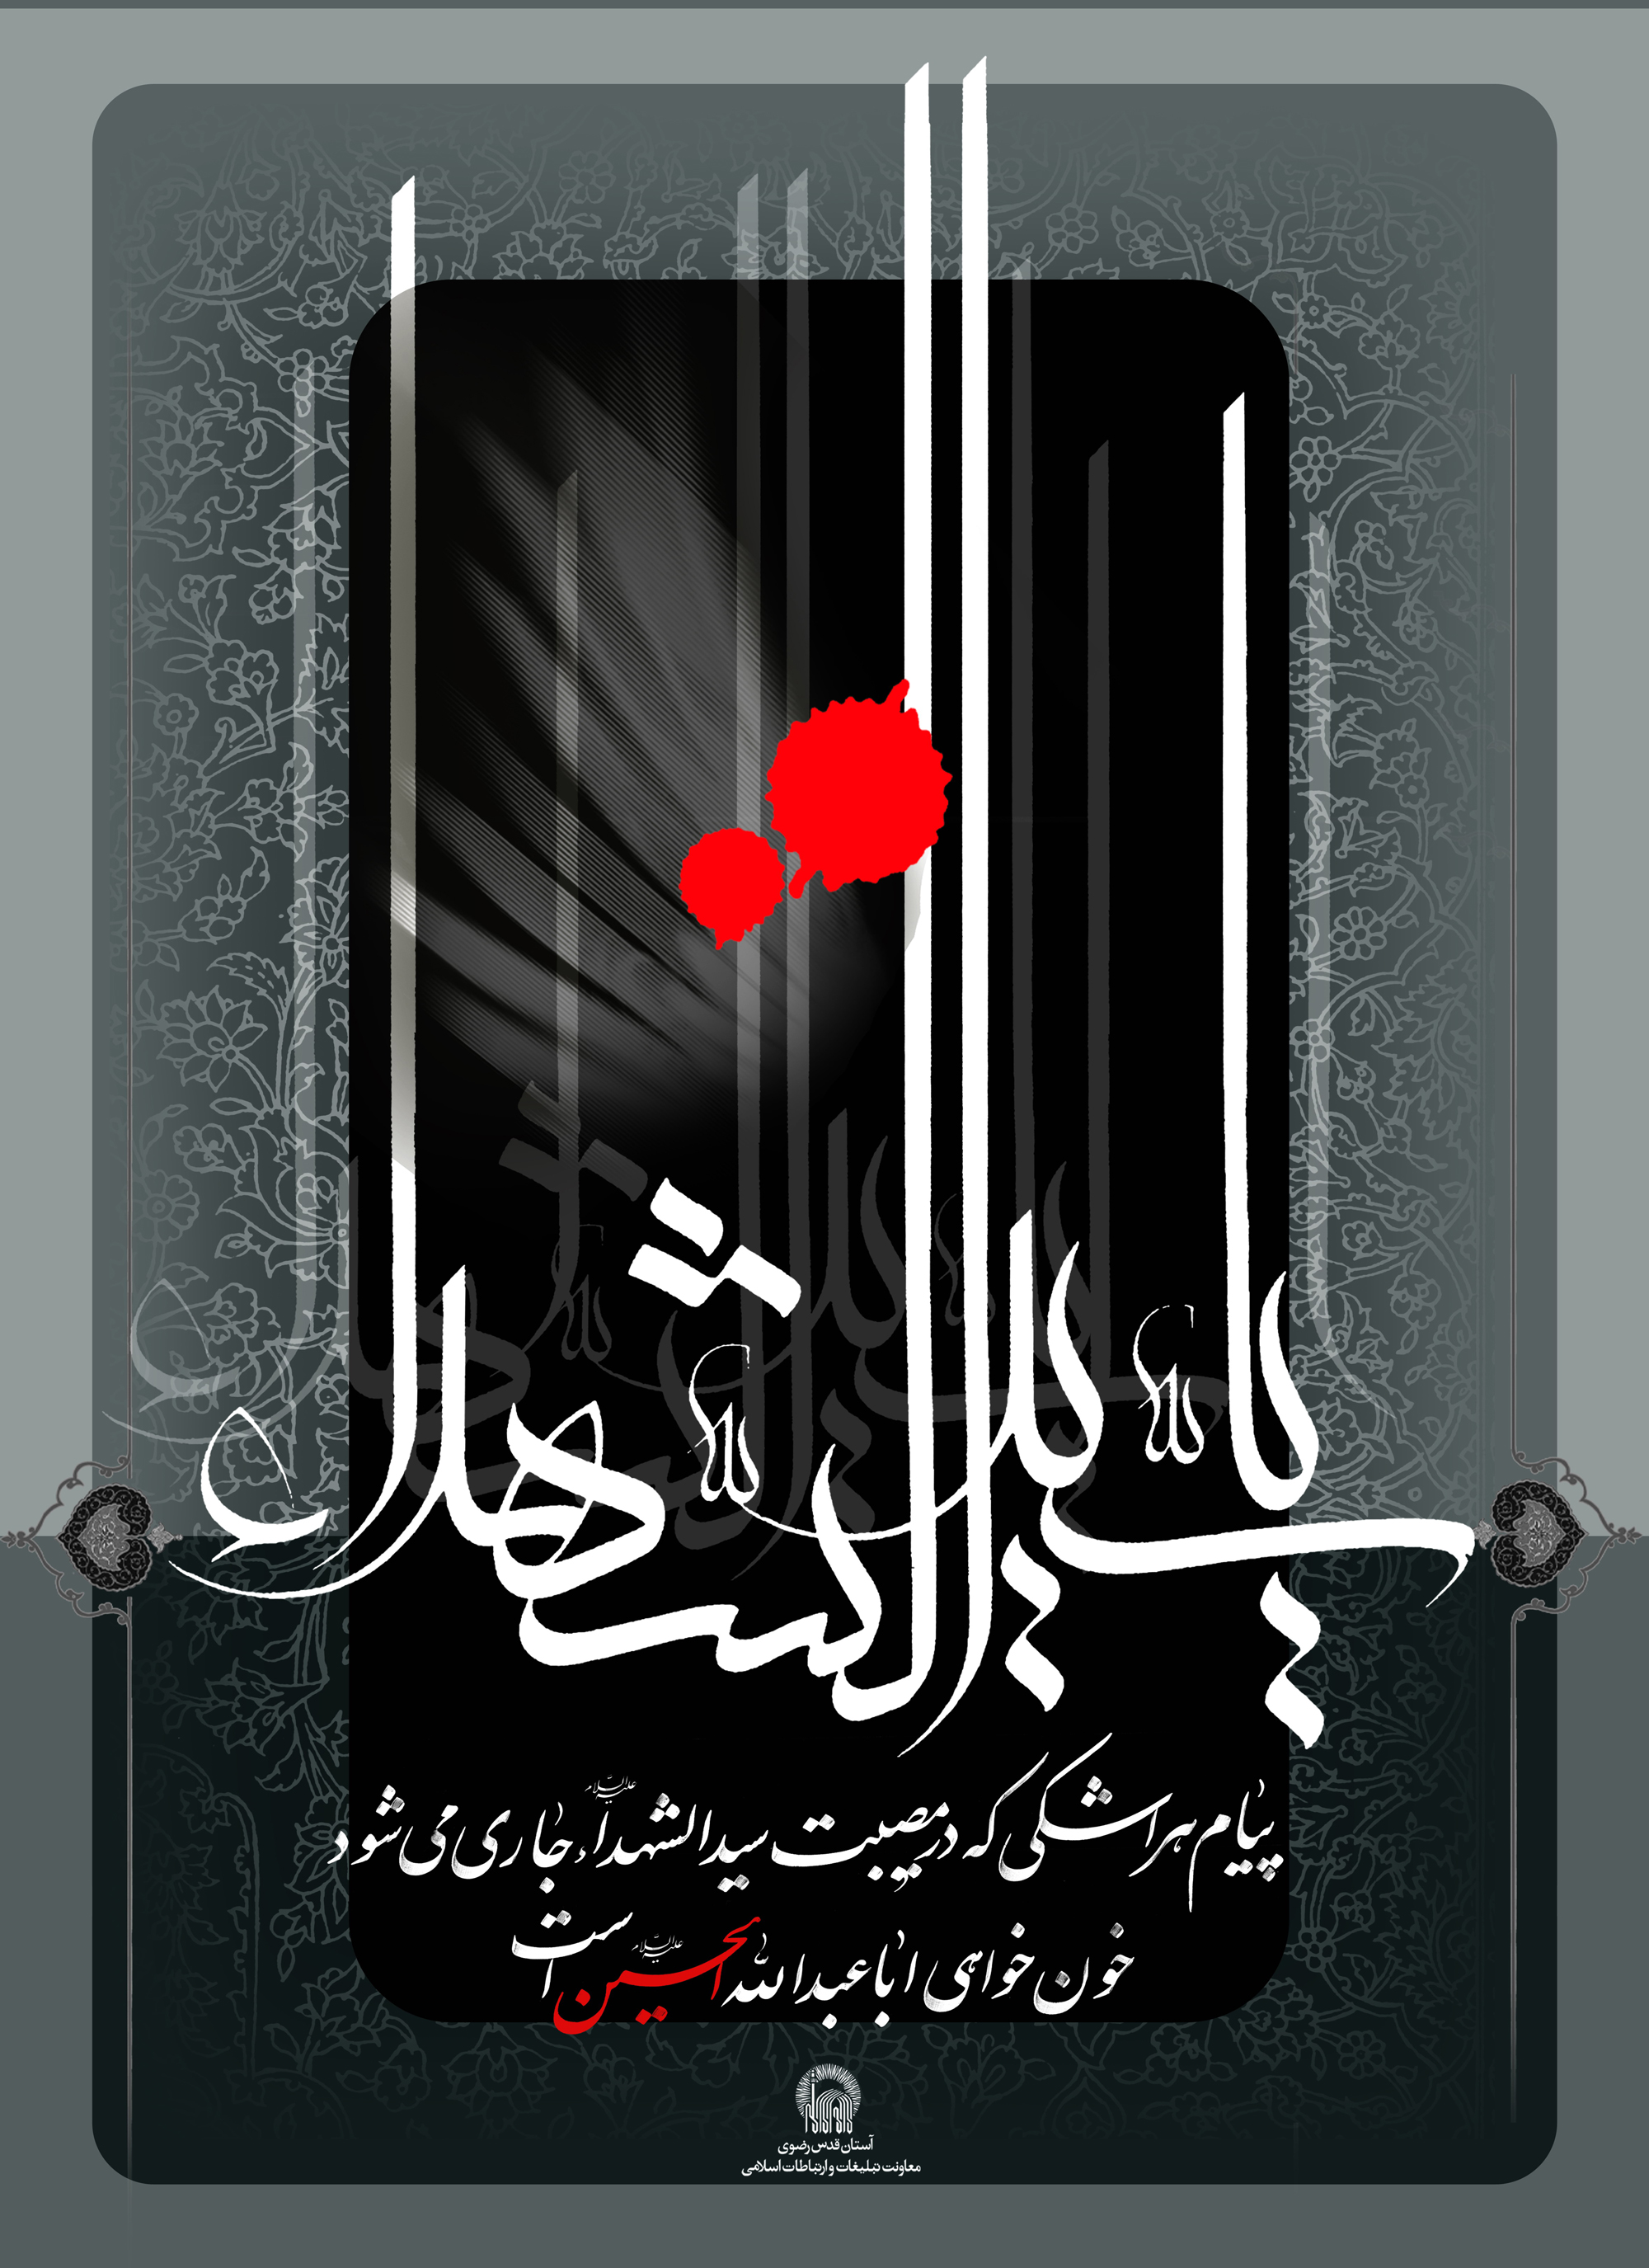 ۰۰۶_ImamHussein_www.IslamicWallpaper